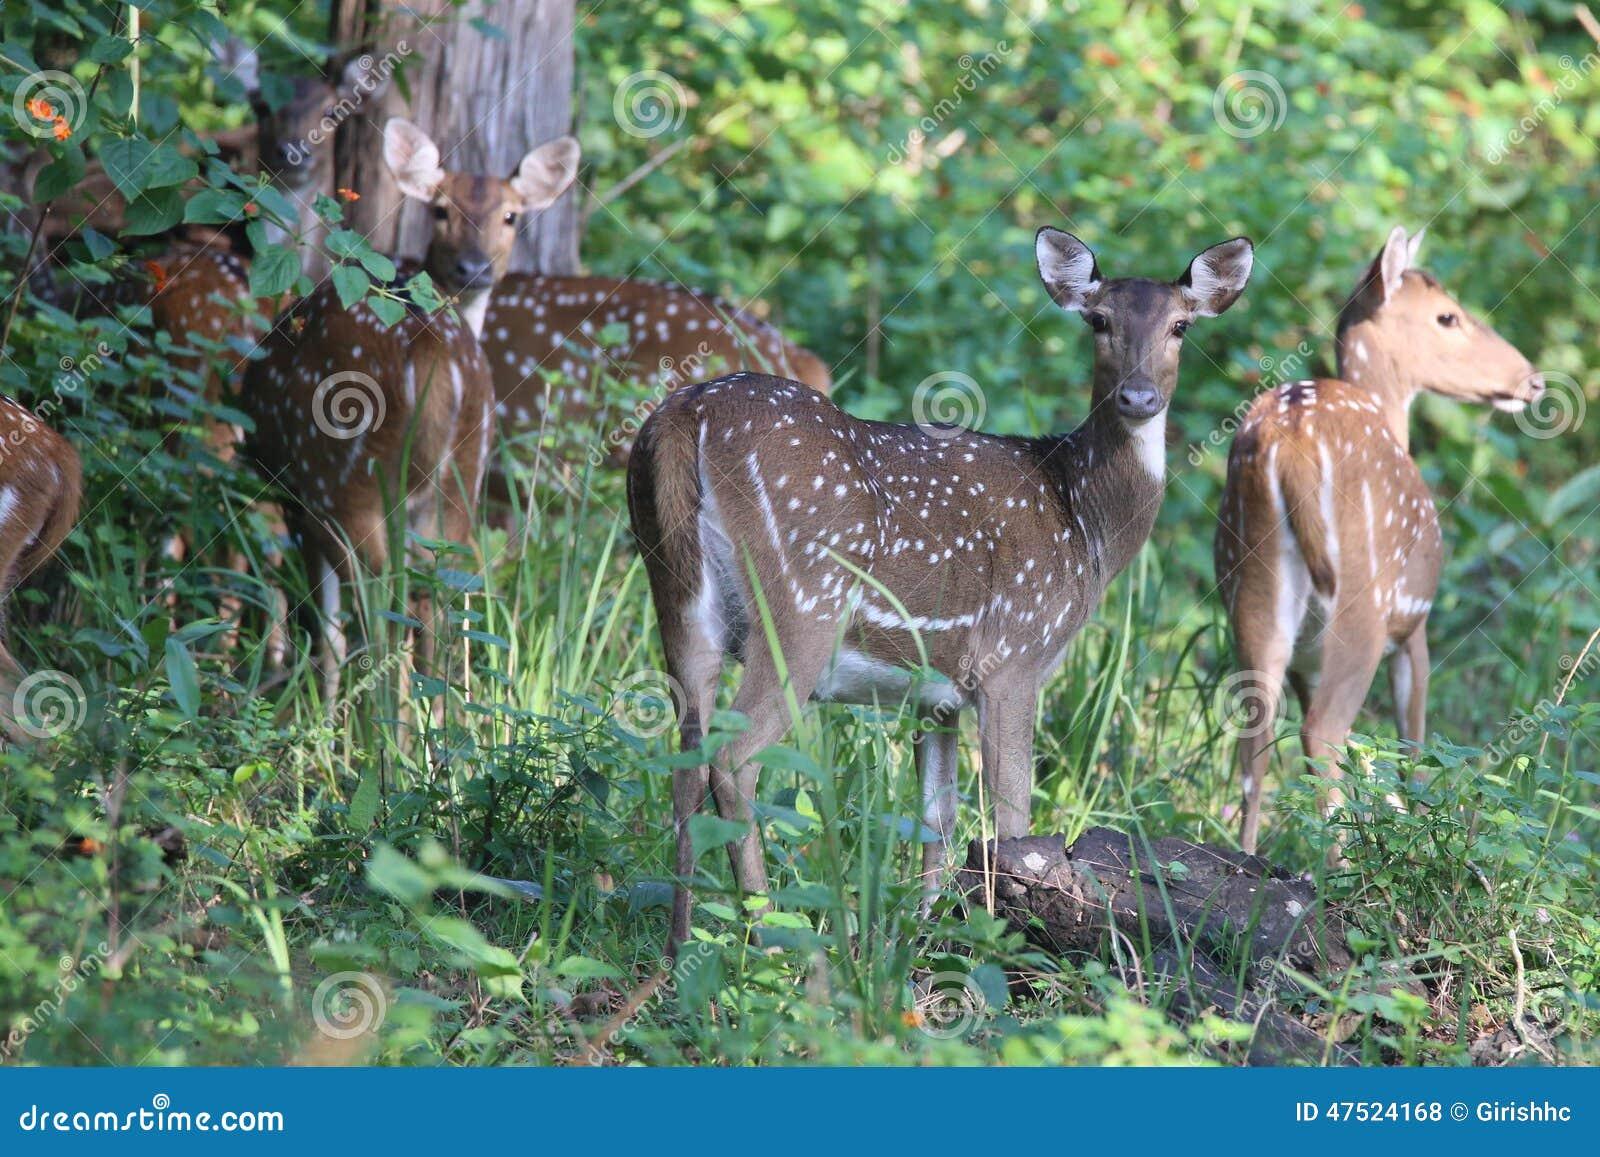 Spotted Deer Herd In Habitat Stock Photo Image Of Protected Deer